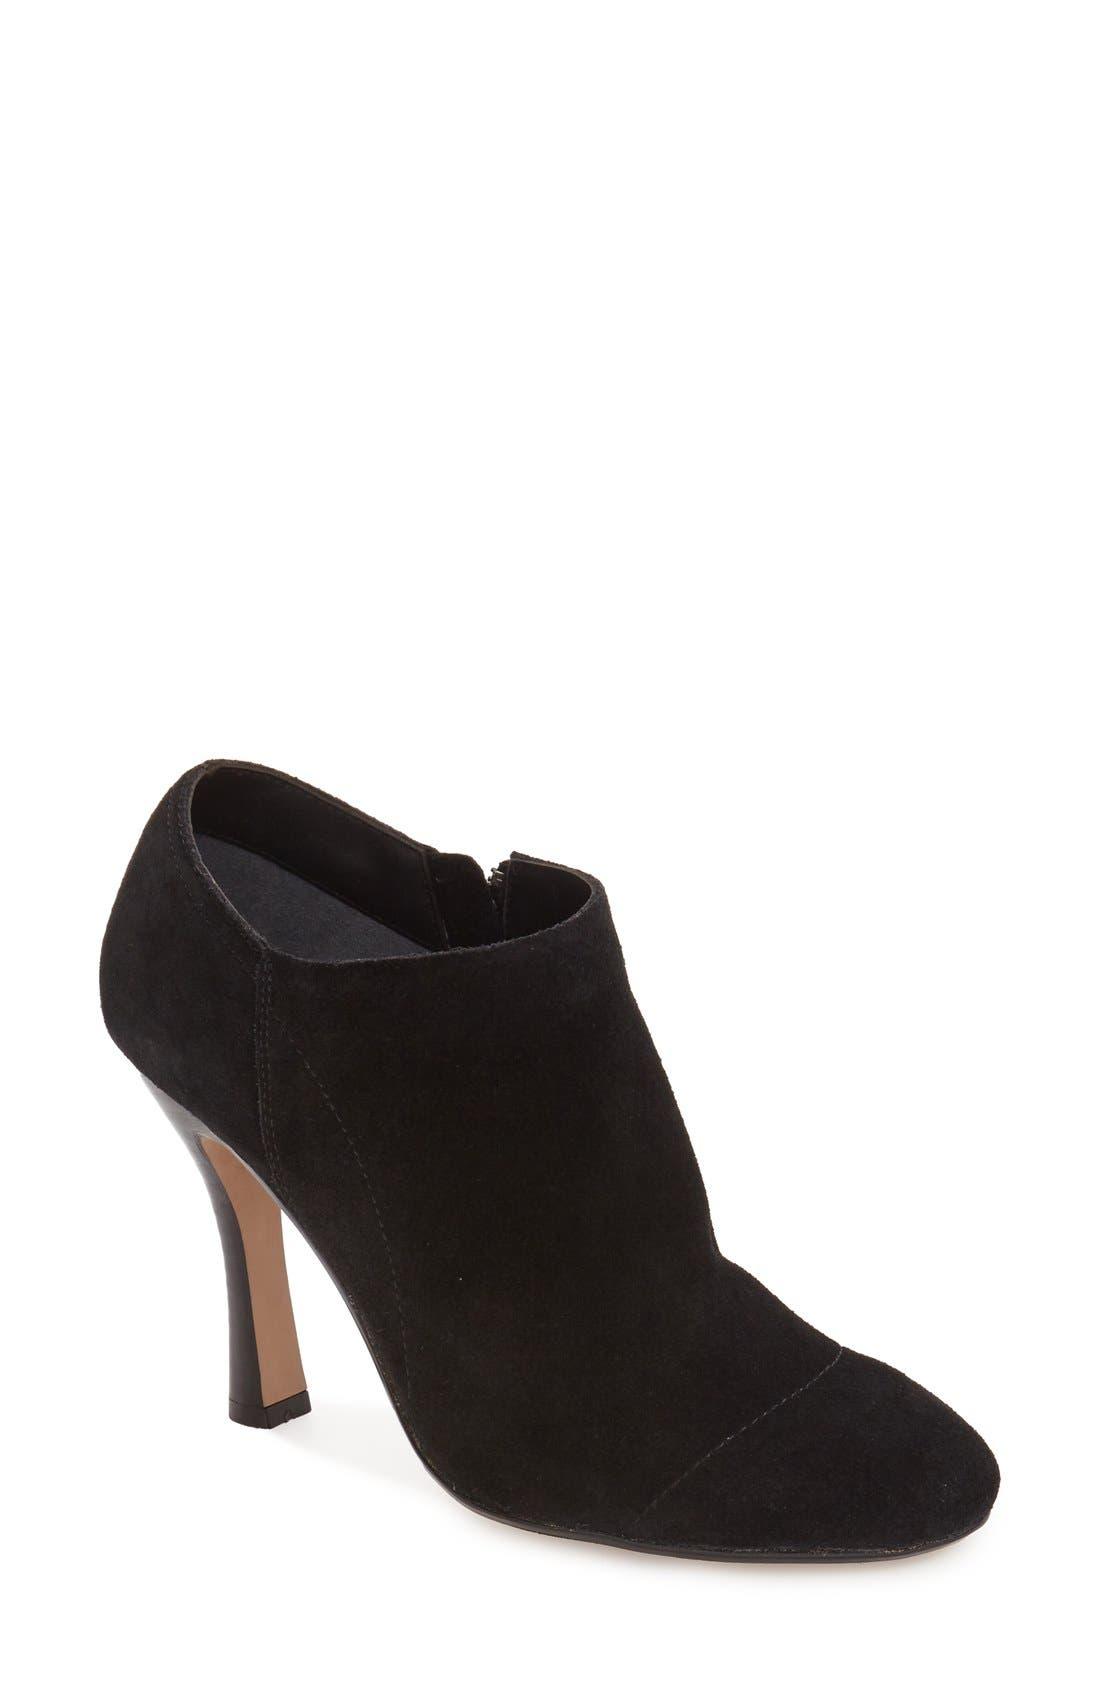 Nina 'Iolathe' Flared Heel Bootie,                         Main,                         color, 008